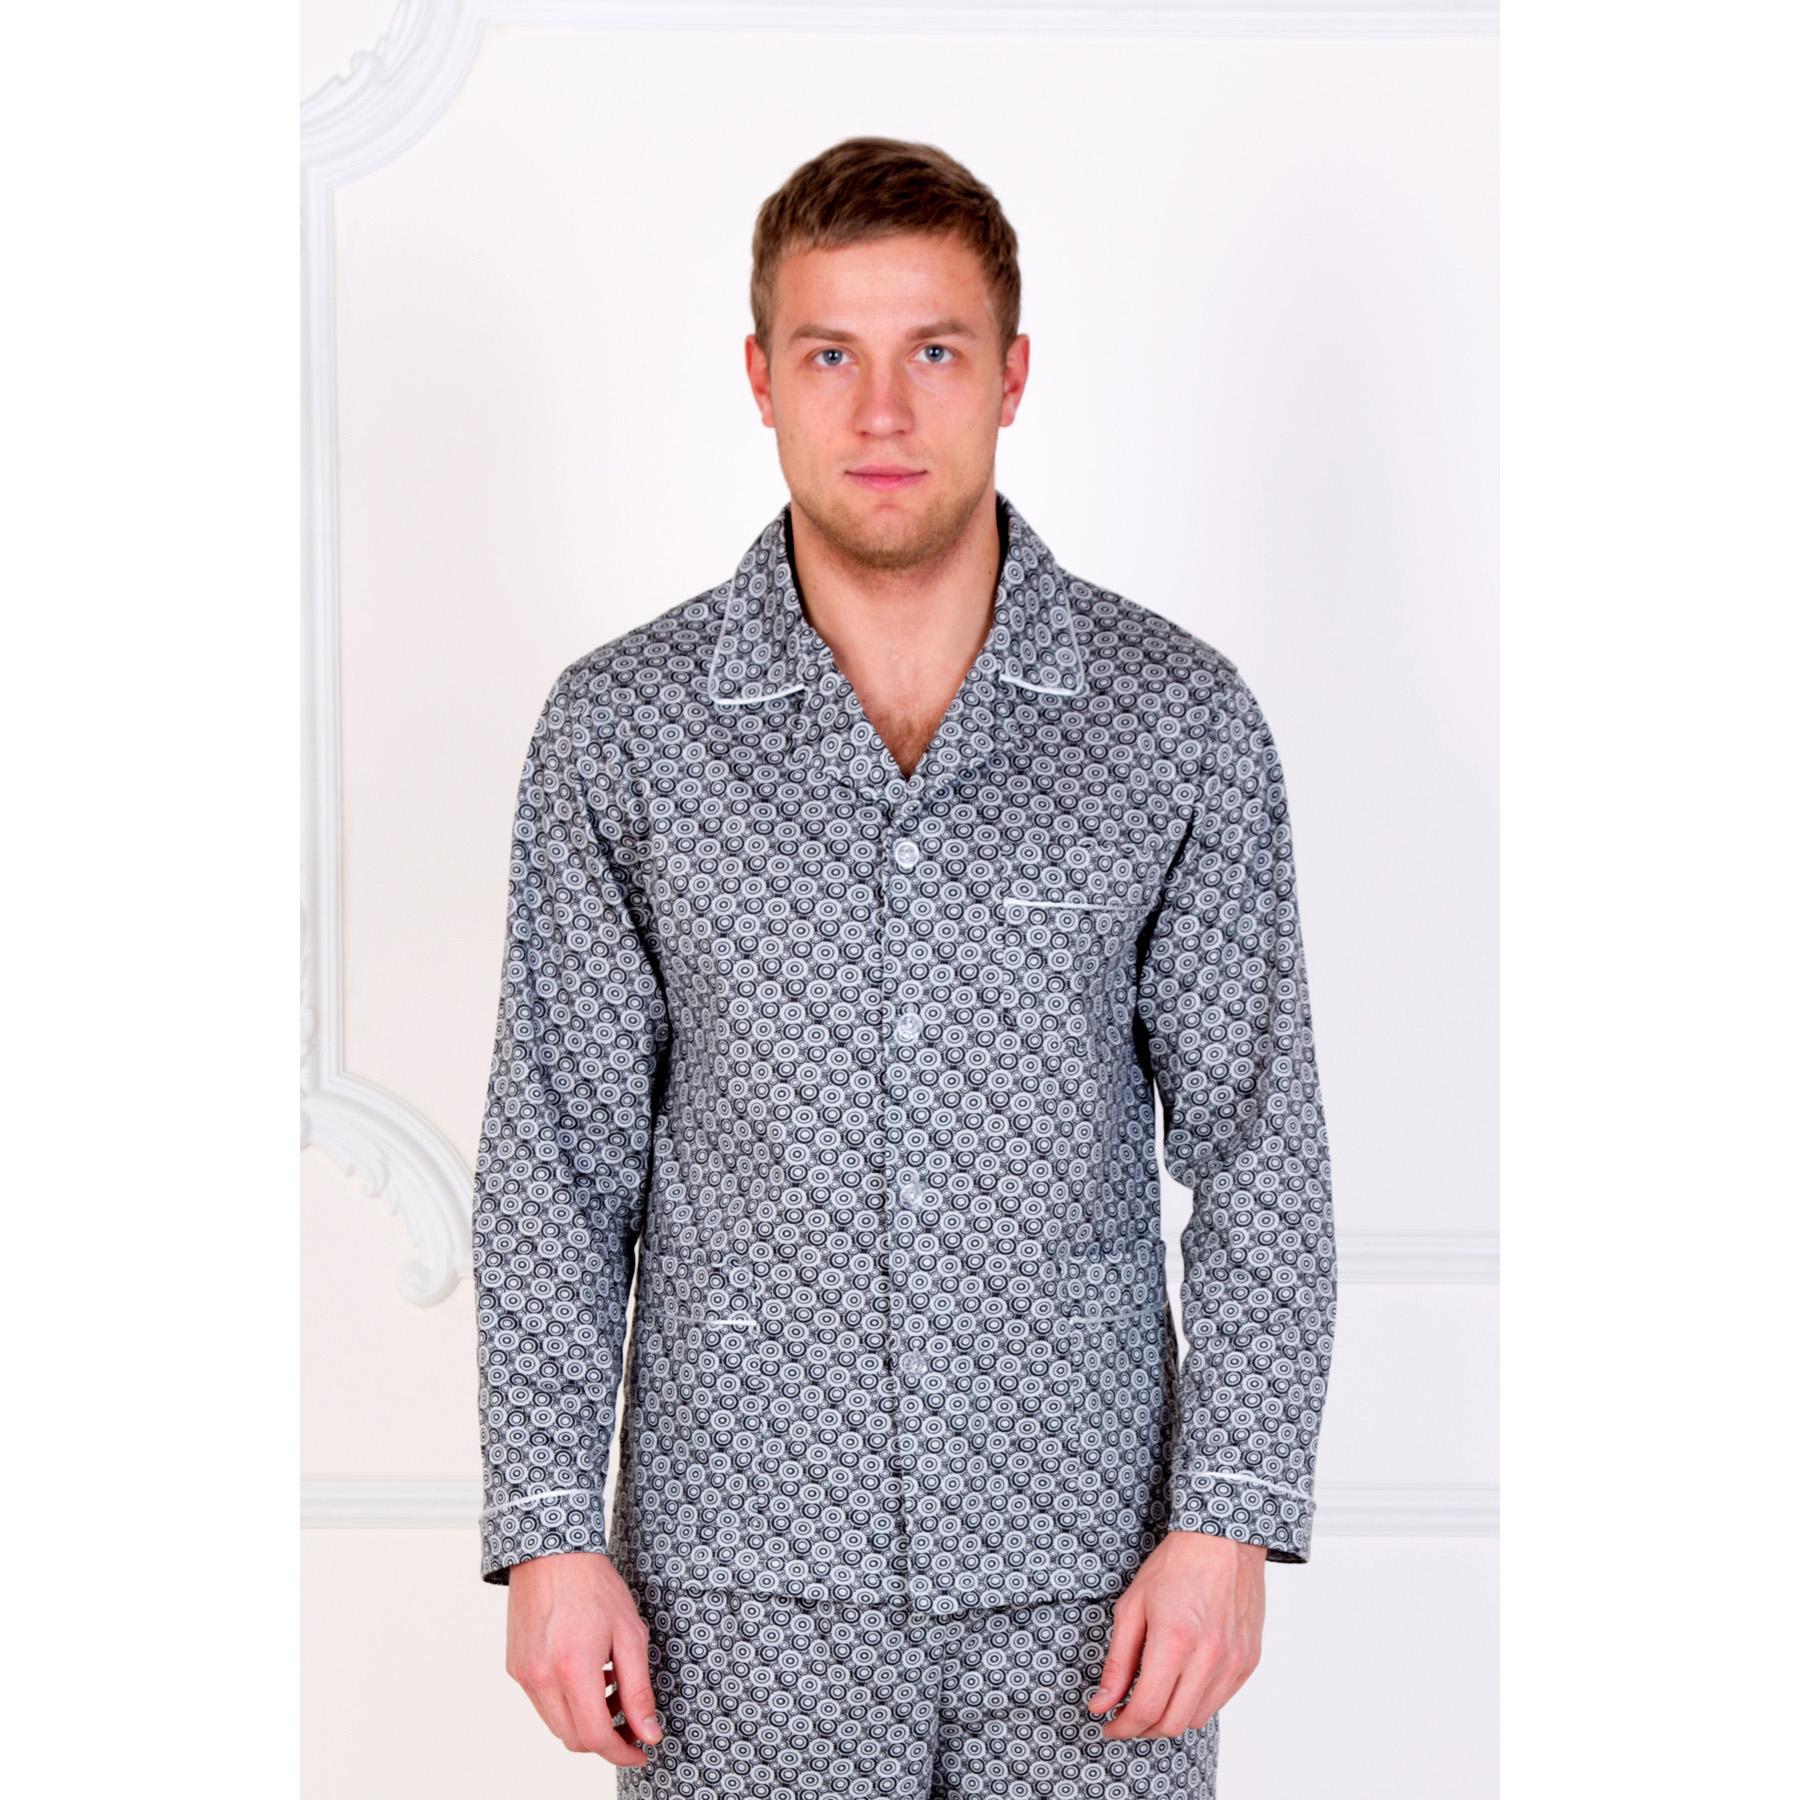 Мужская пижама Ричмонд, размер 54Нижнее и нательное белье<br>Обхват груди:108 см<br>Обхват талии:100 см<br>Обхват бедер:110 см<br>Рост:178-184 см<br><br>Тип: Муж. костюм<br>Размер: 54<br>Материал: Кулирка